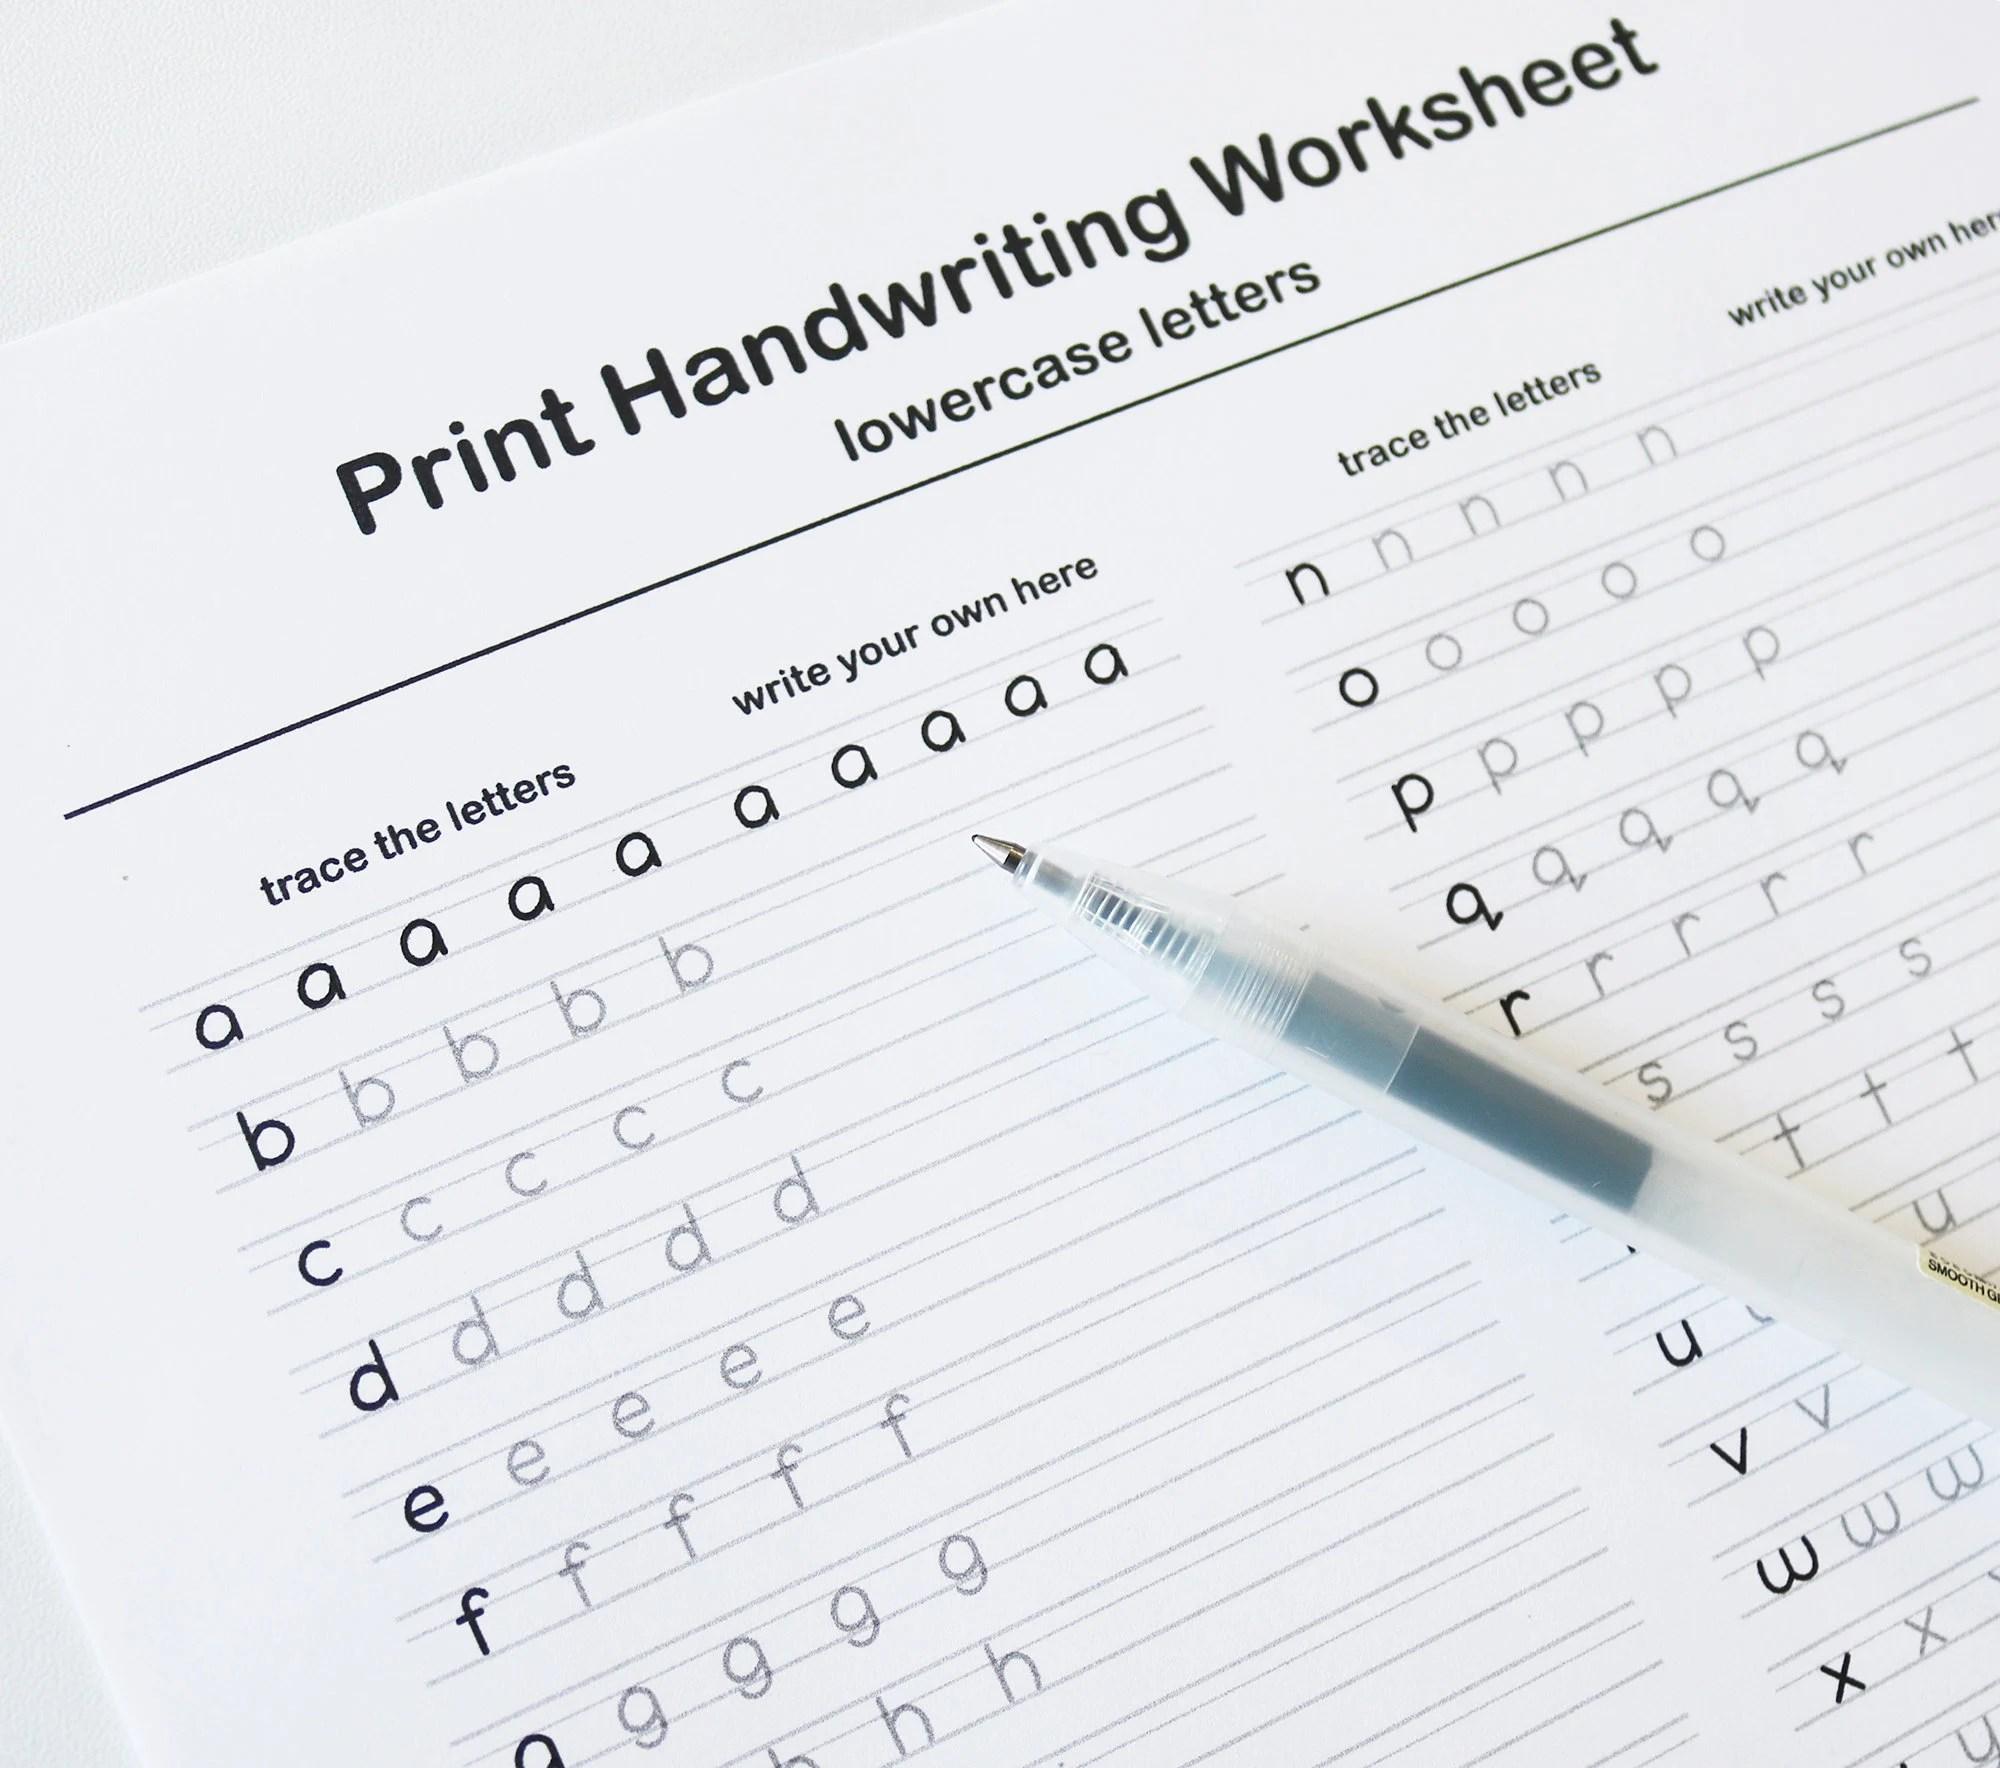 Printable Handwriting Worksheet Lowercase And Uppercase